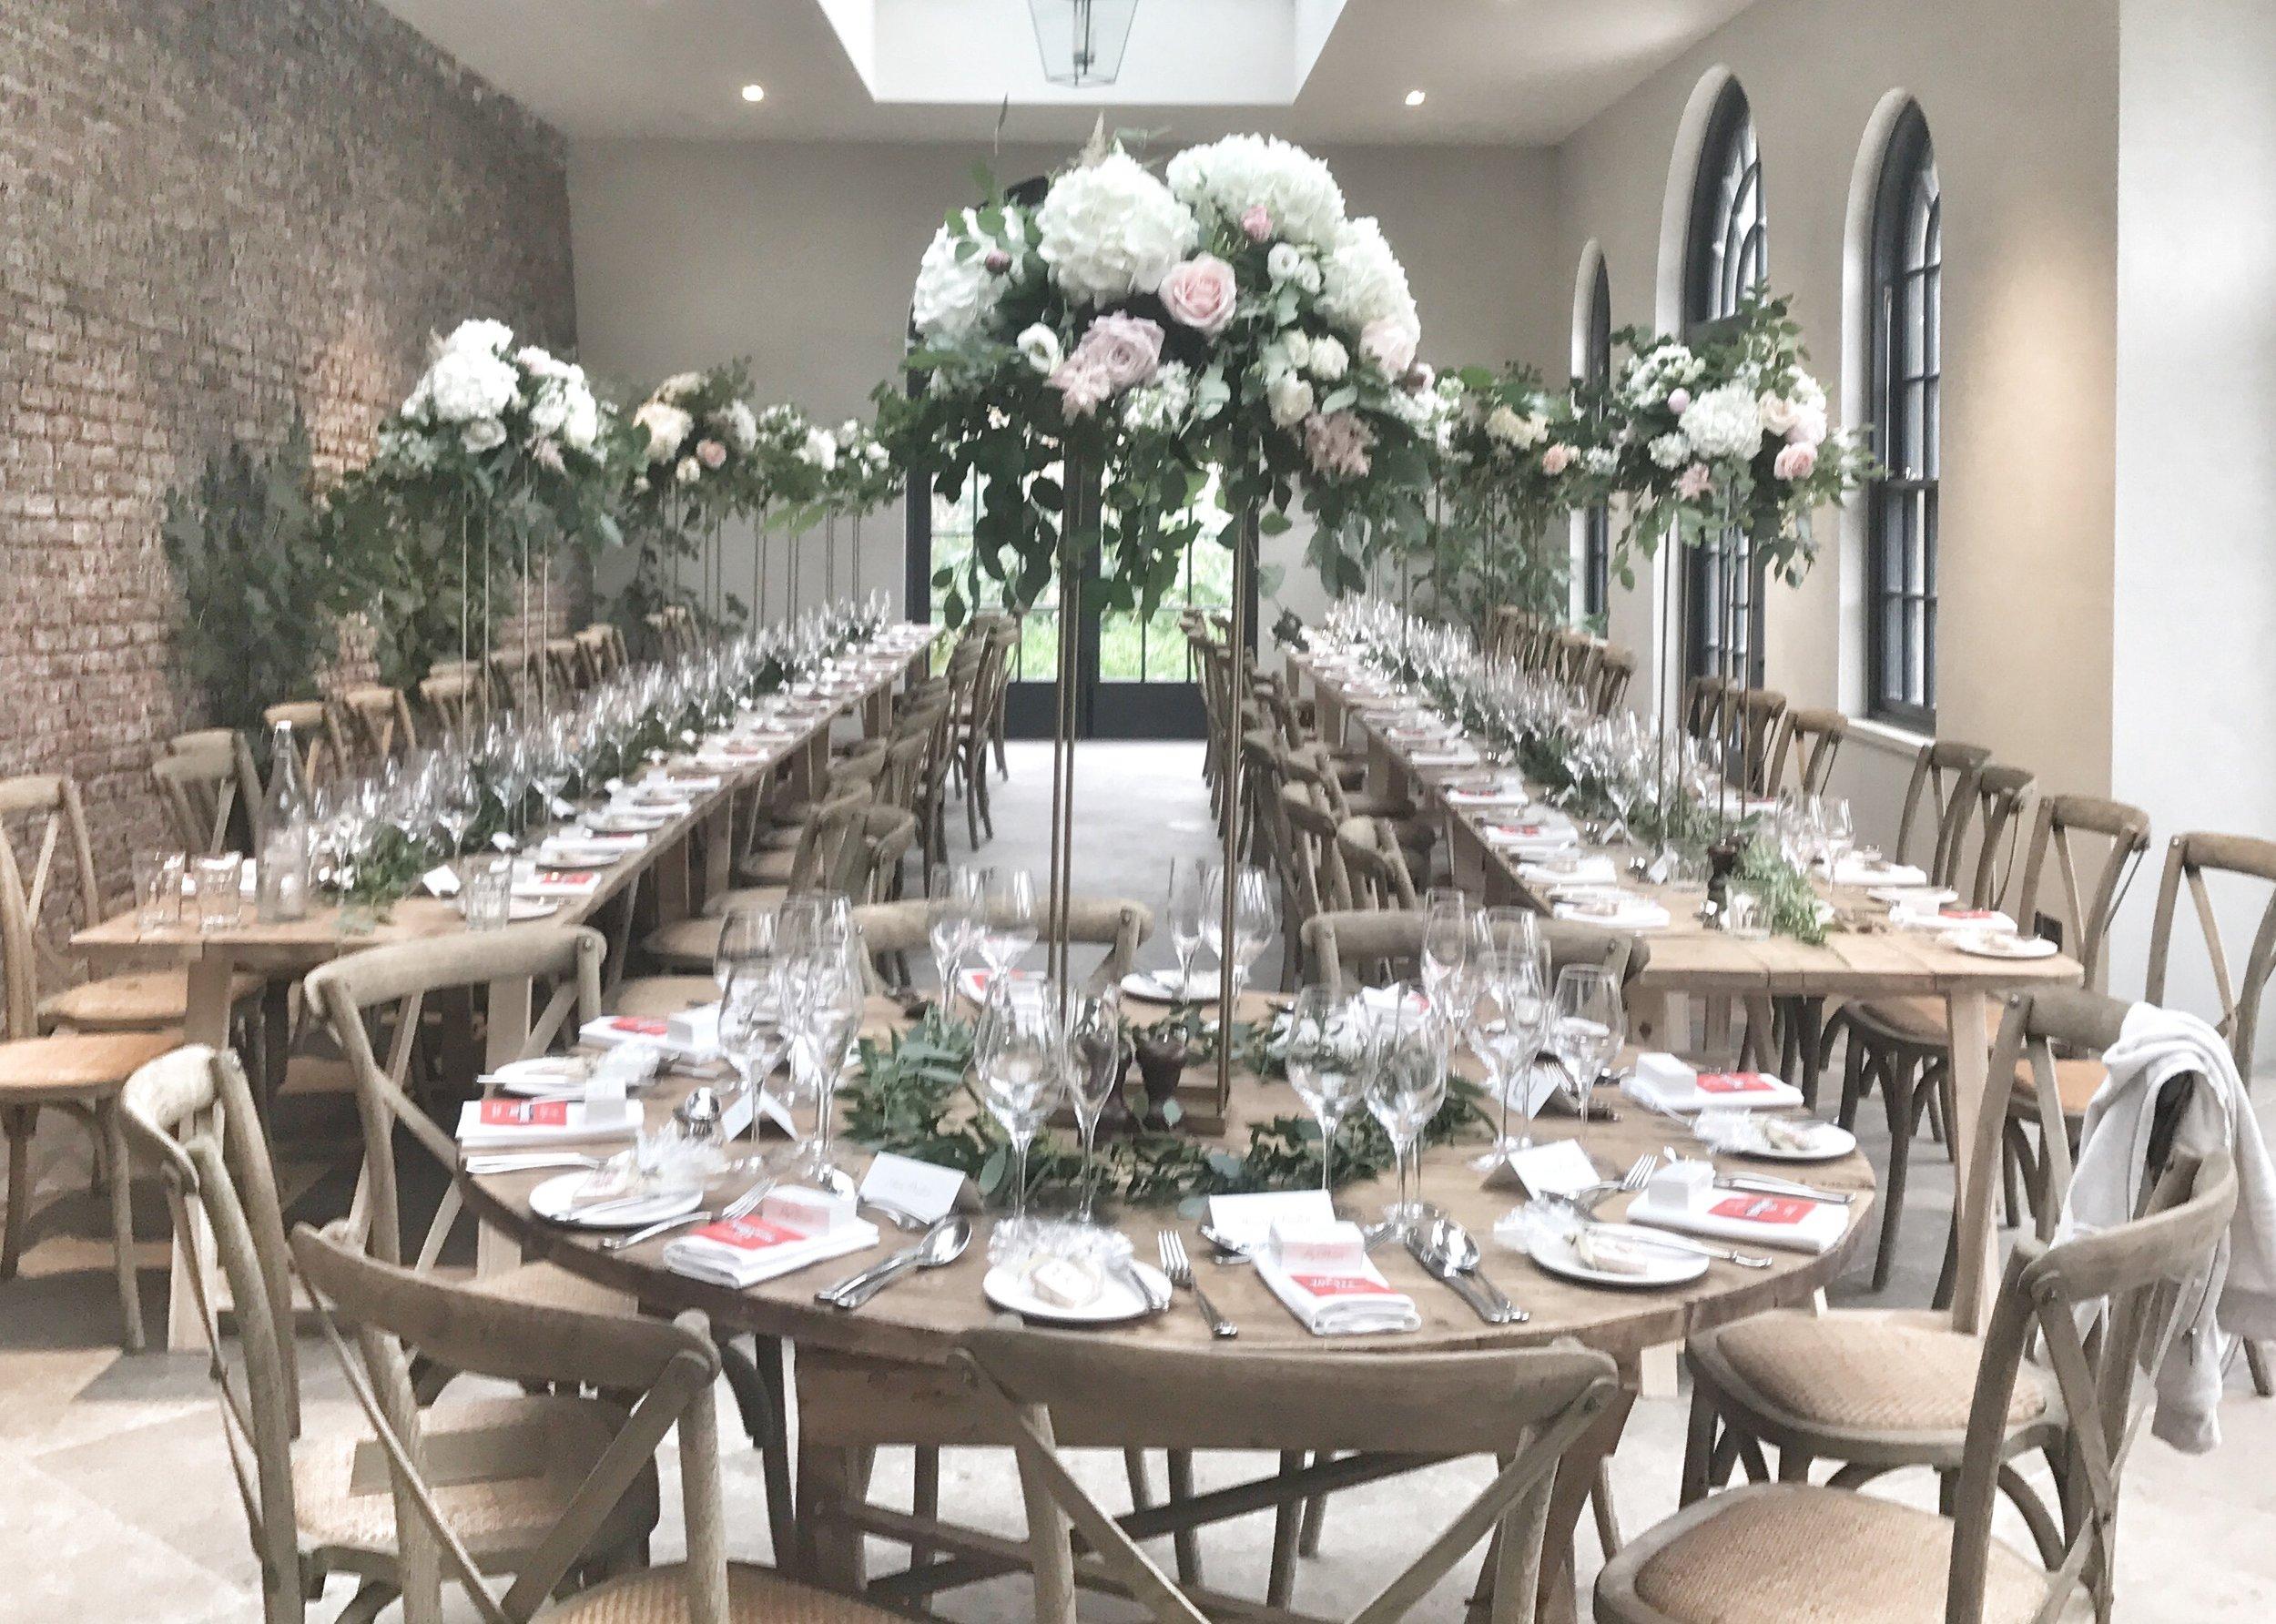 Middletonlodge wedding flowers river and rose